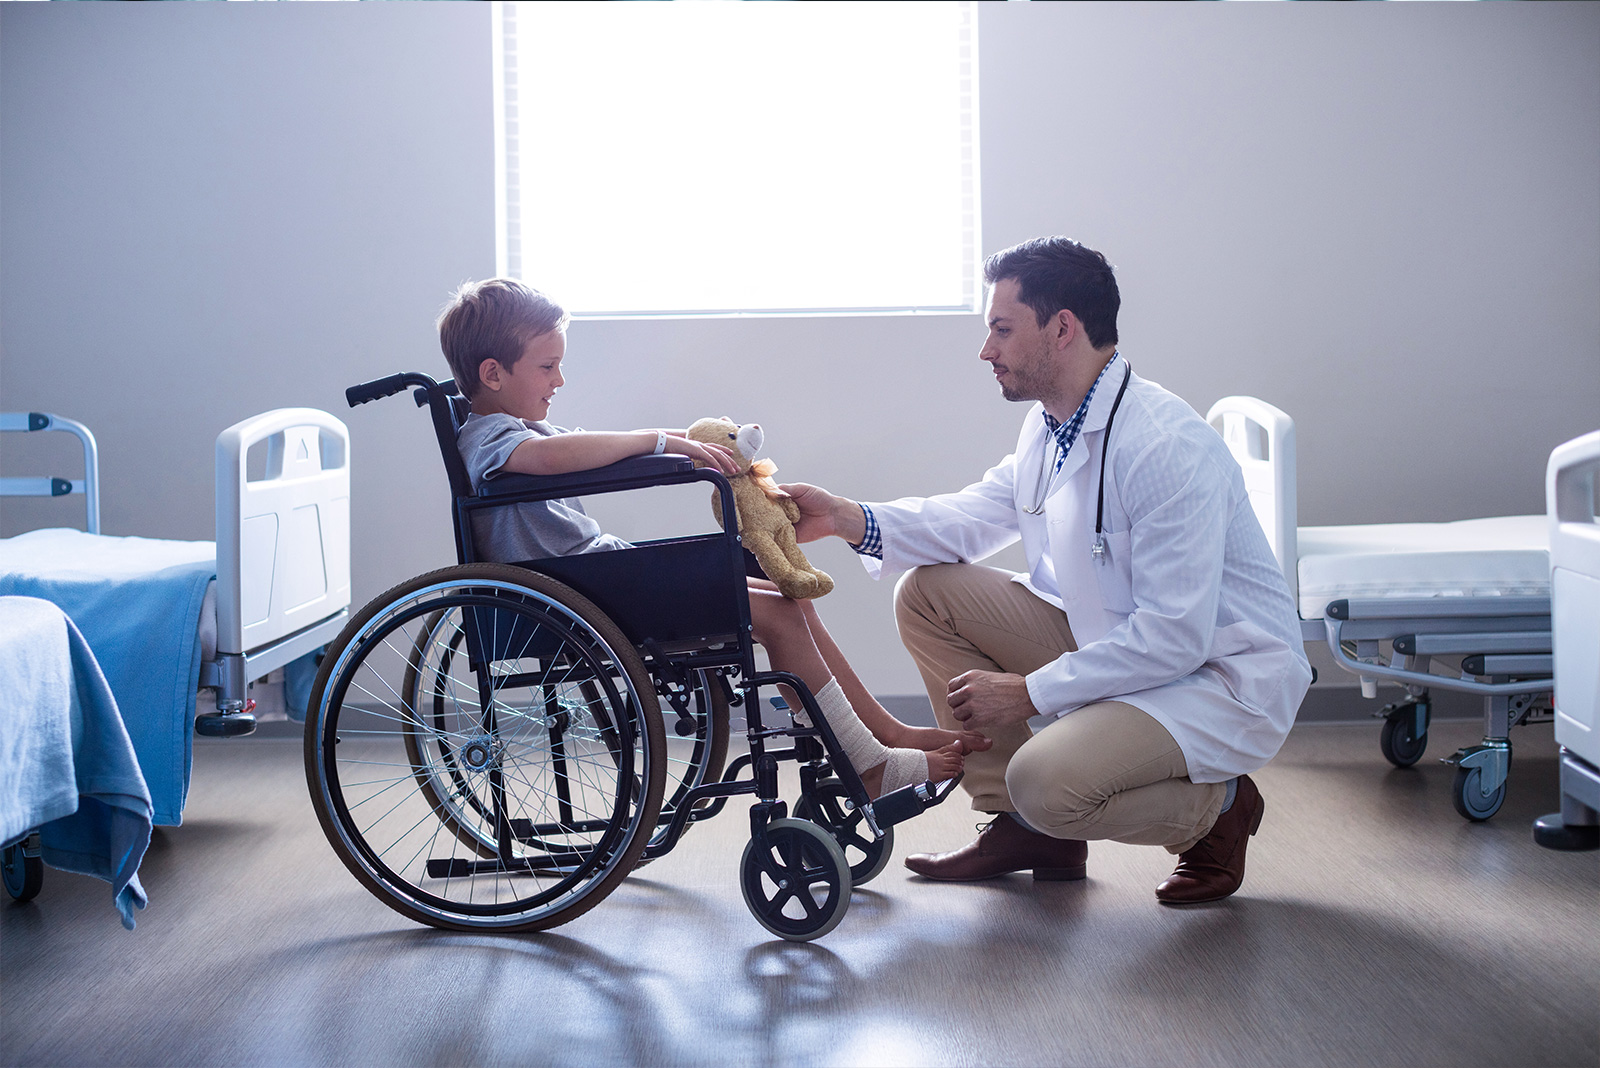 Servicio de traumatología sin cita previa